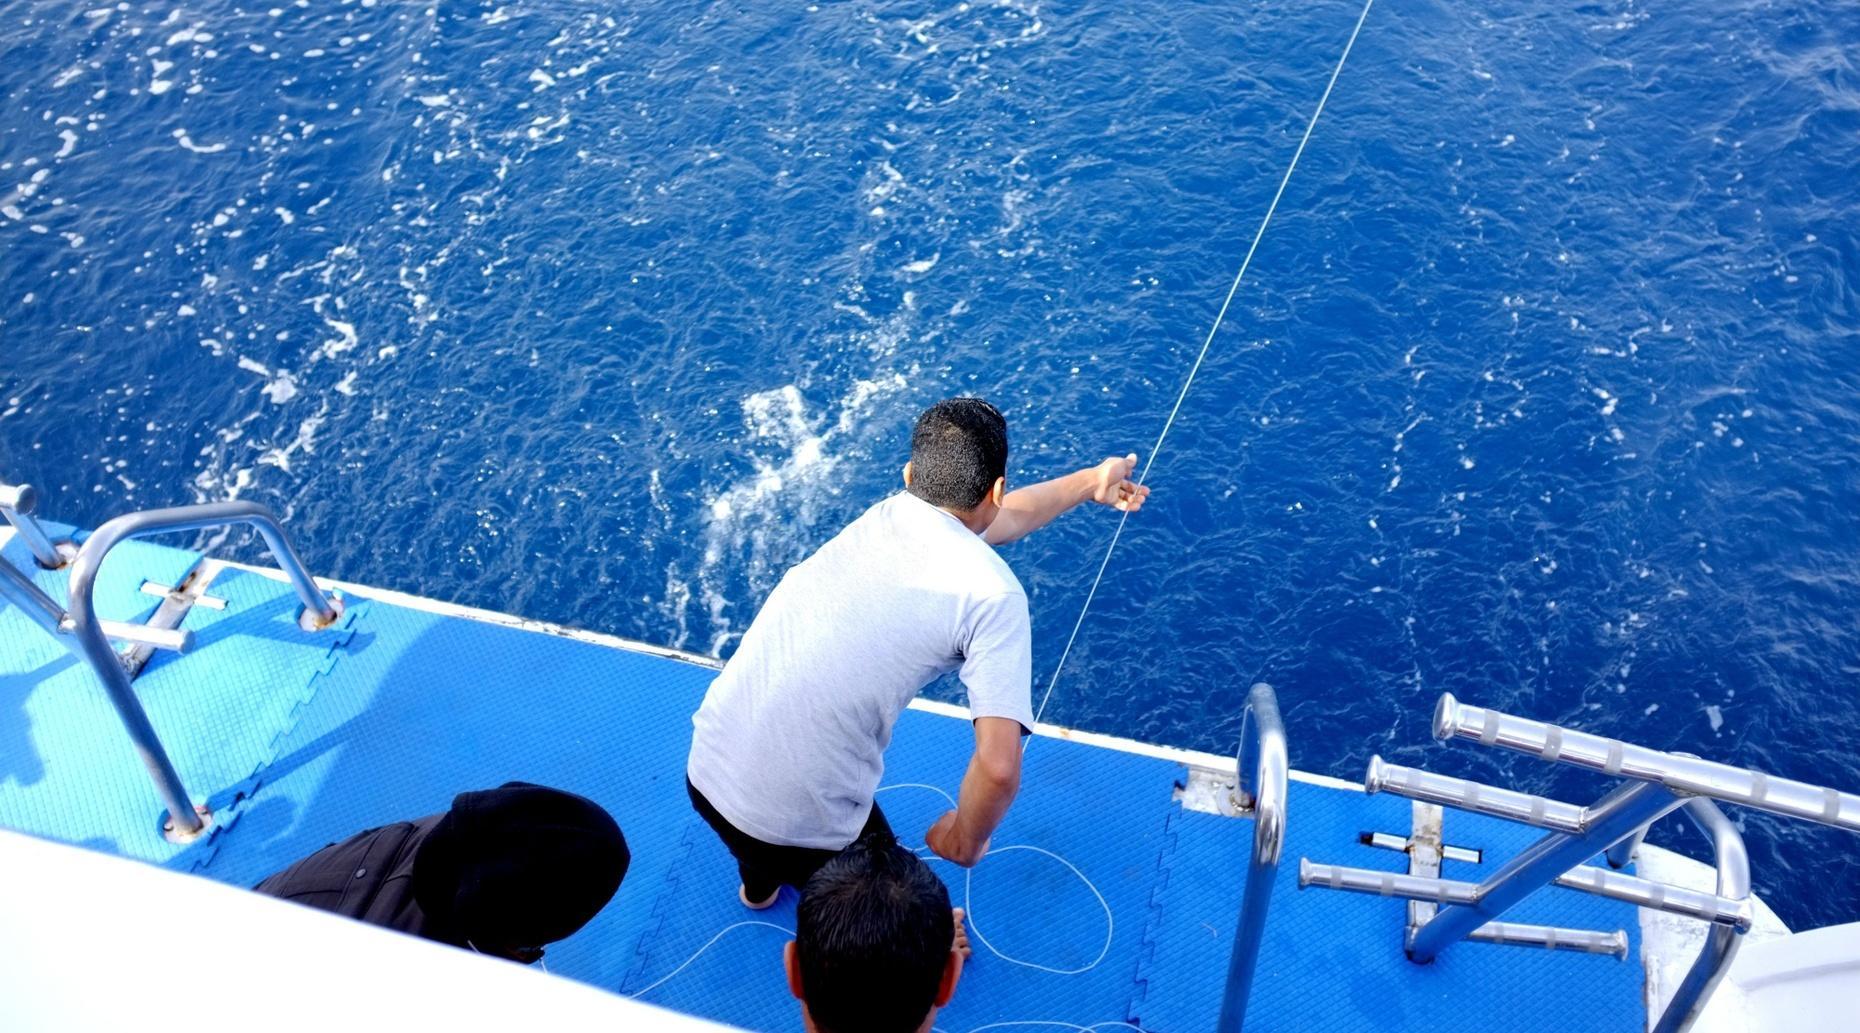 Deep Sea Half-Day Fishing Charter in the Bahamas